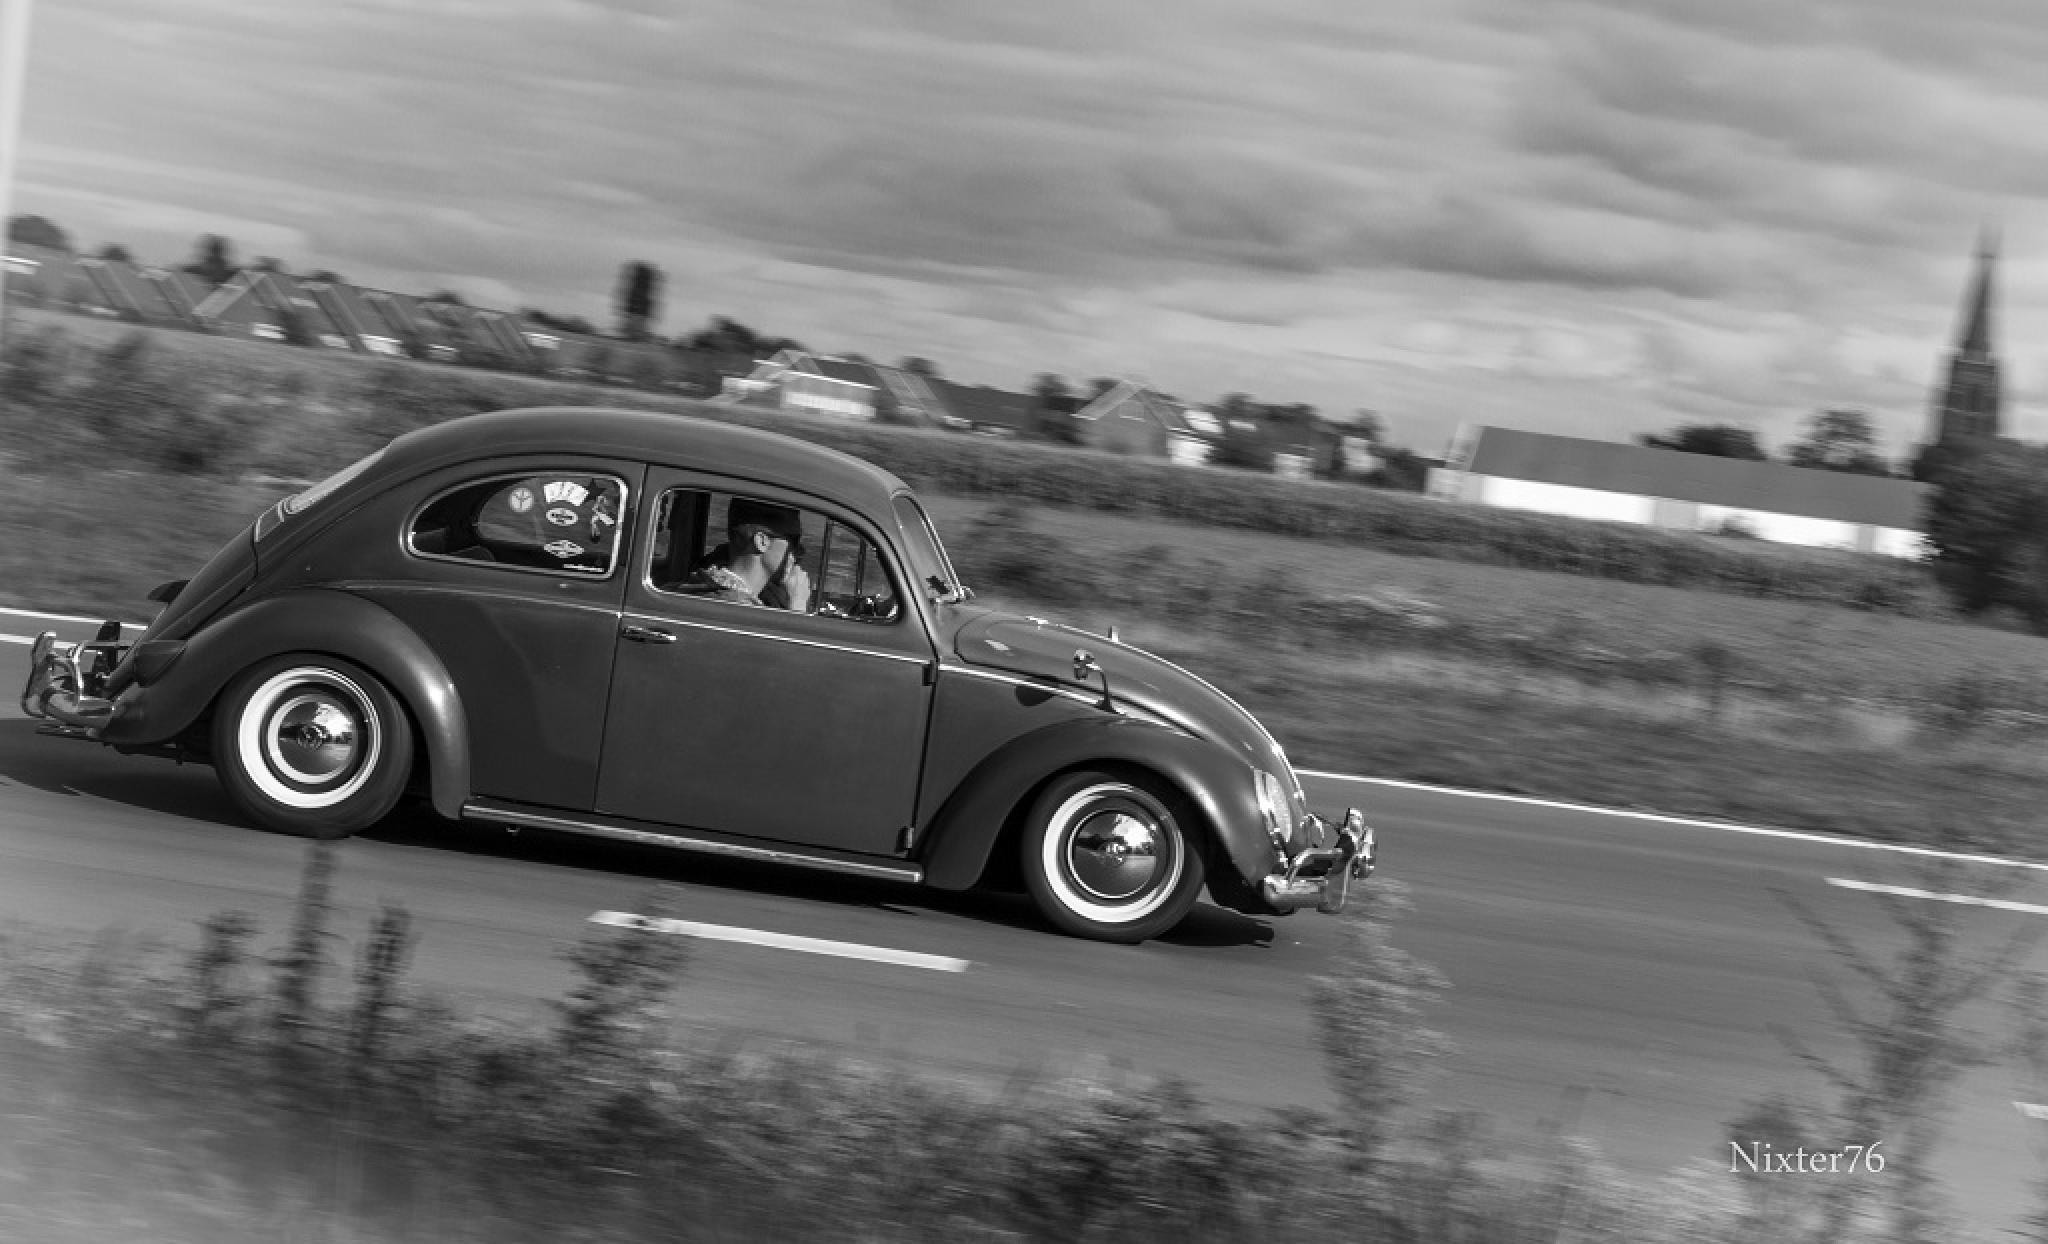 VW kever by NikivandeLaar